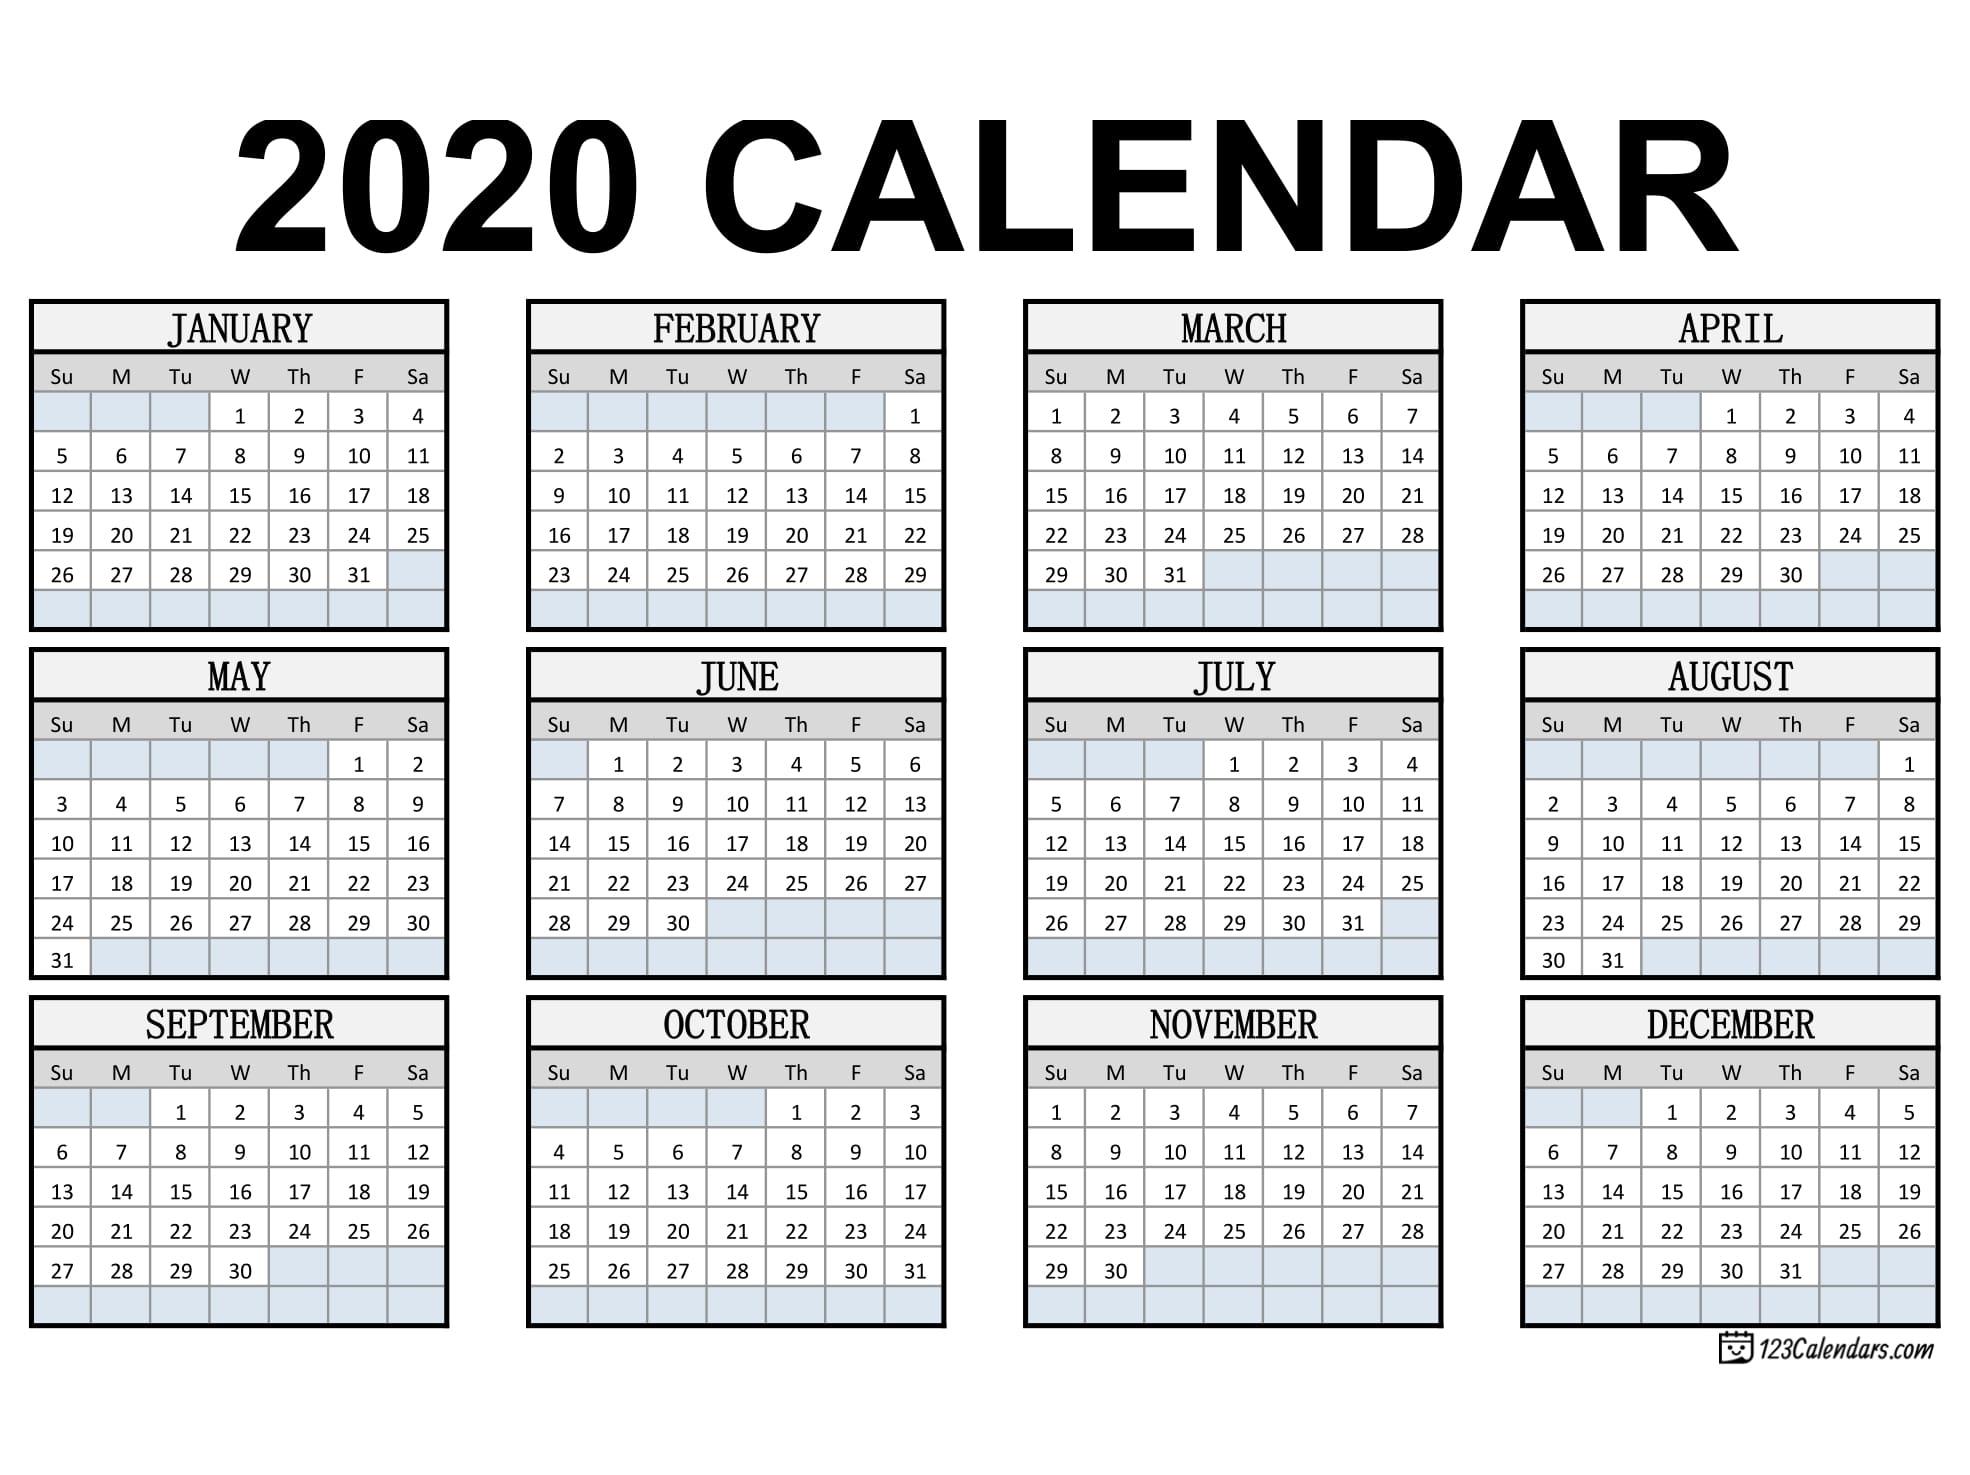 Free Printable 2020 Calendar | 123Calendars inside Pocket Size Monthly Calendar Printable